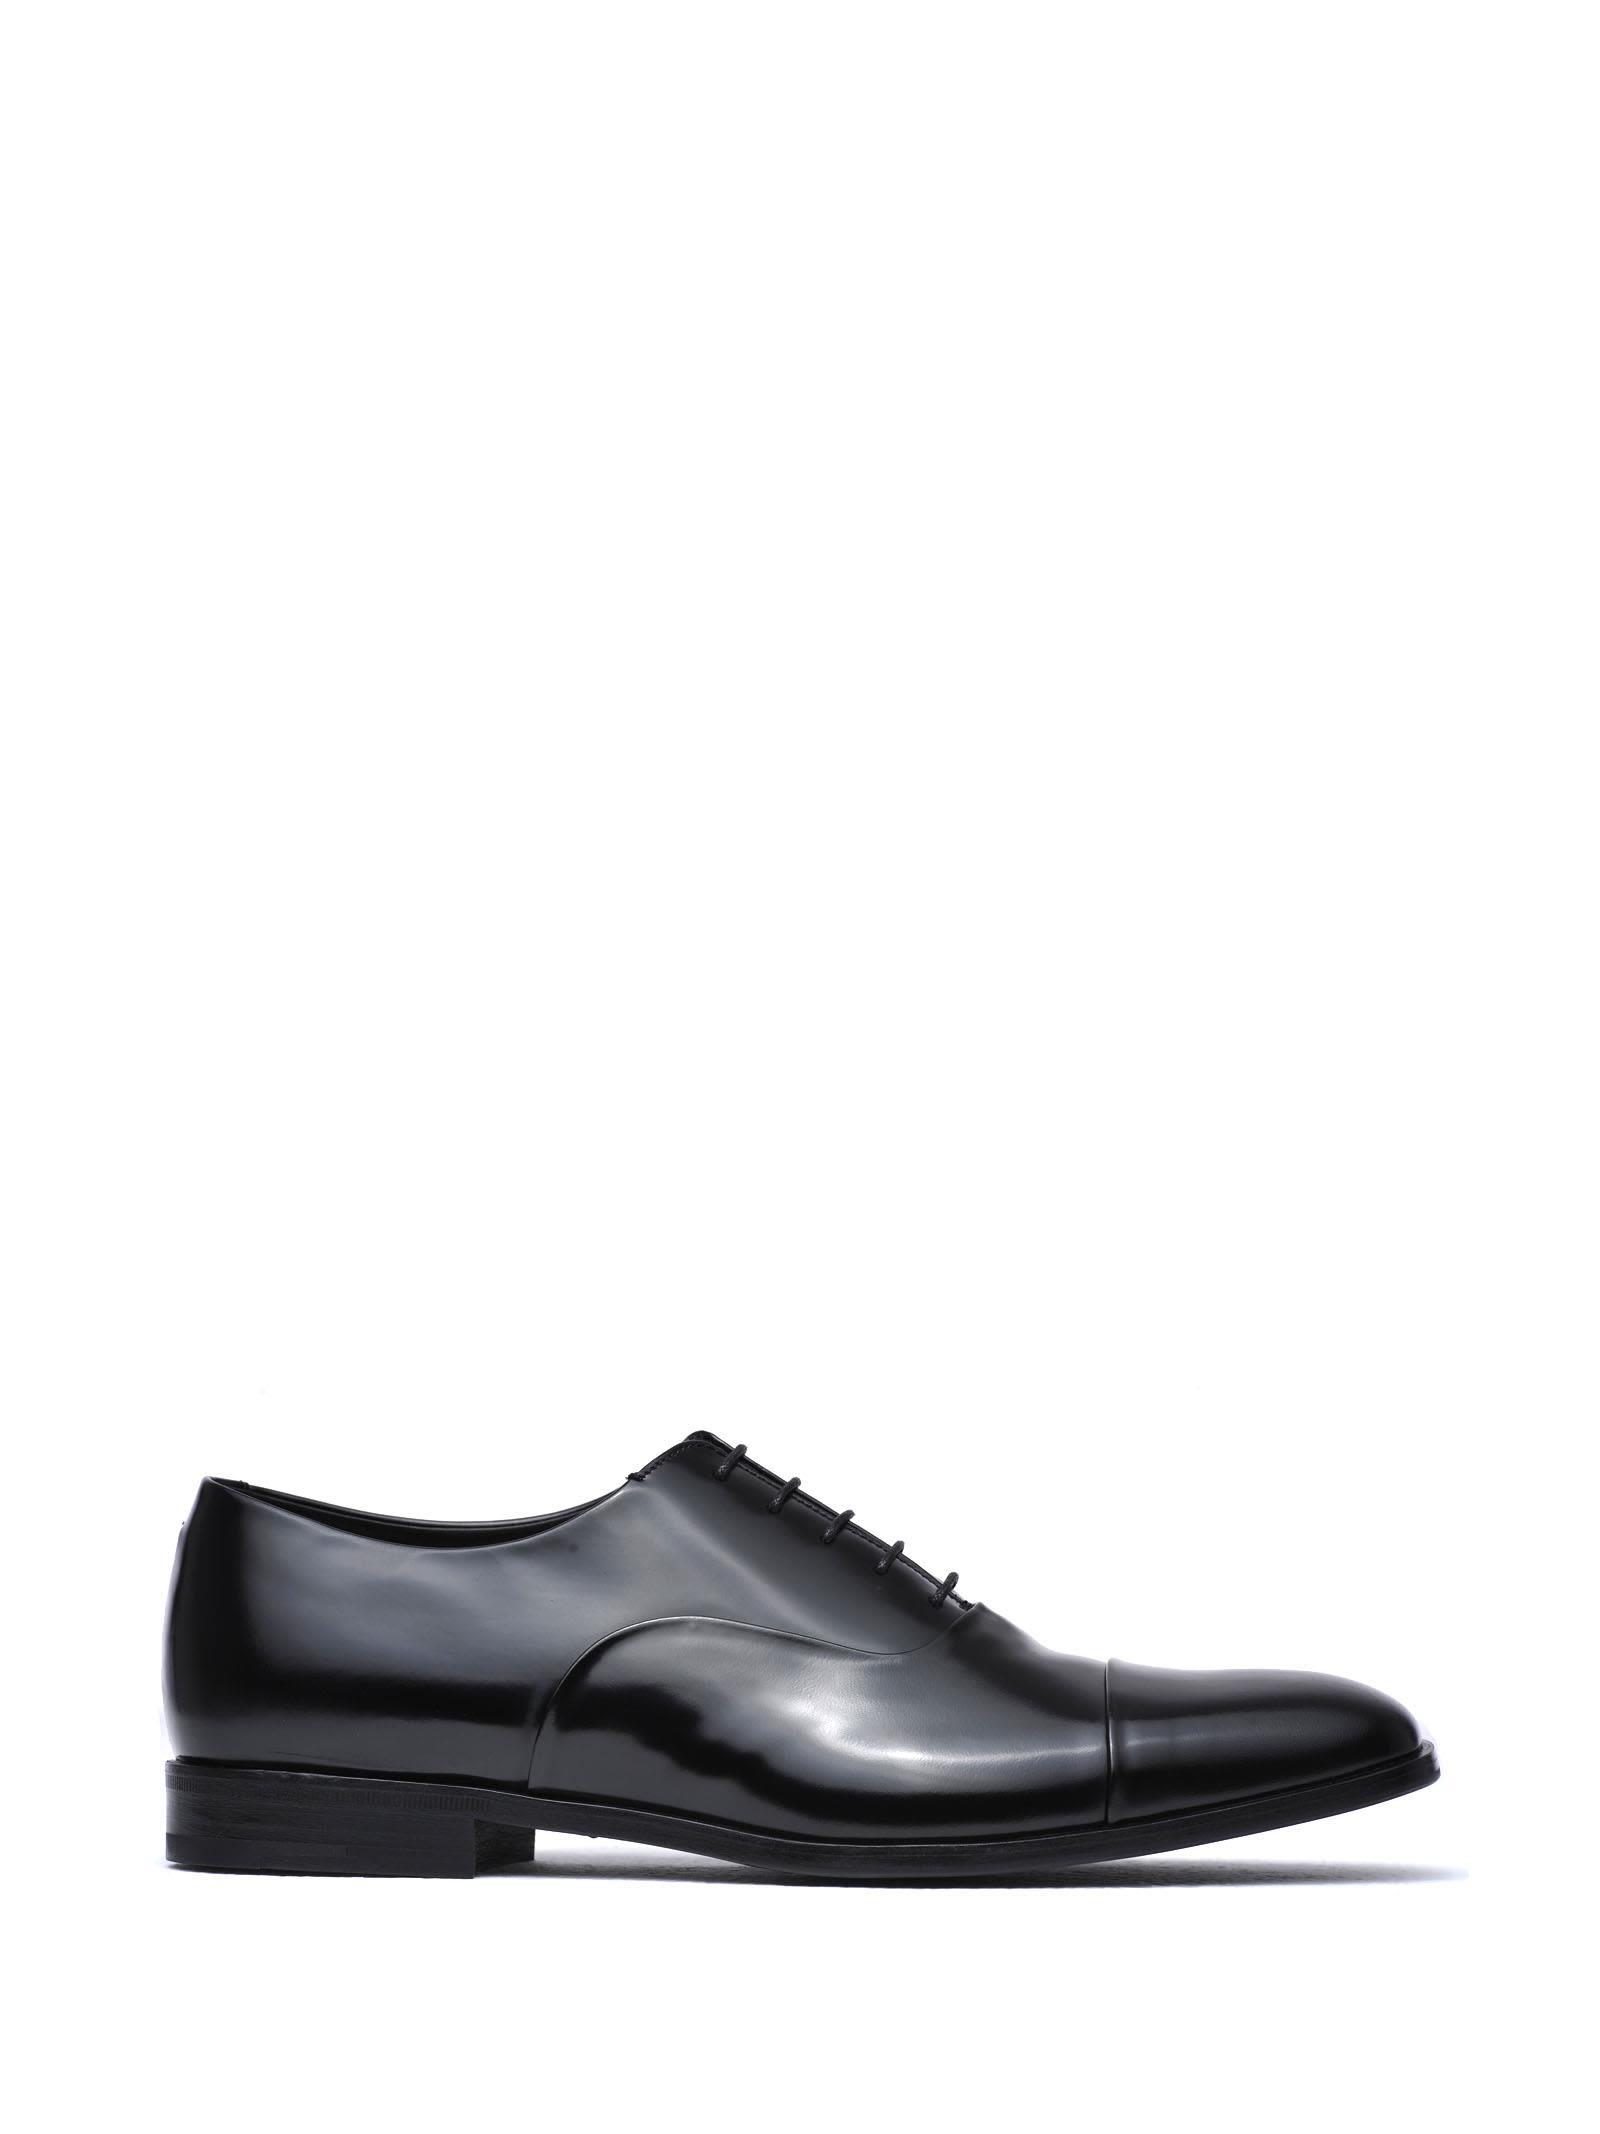 Prada Black Brushed Leather Oxford Shoes